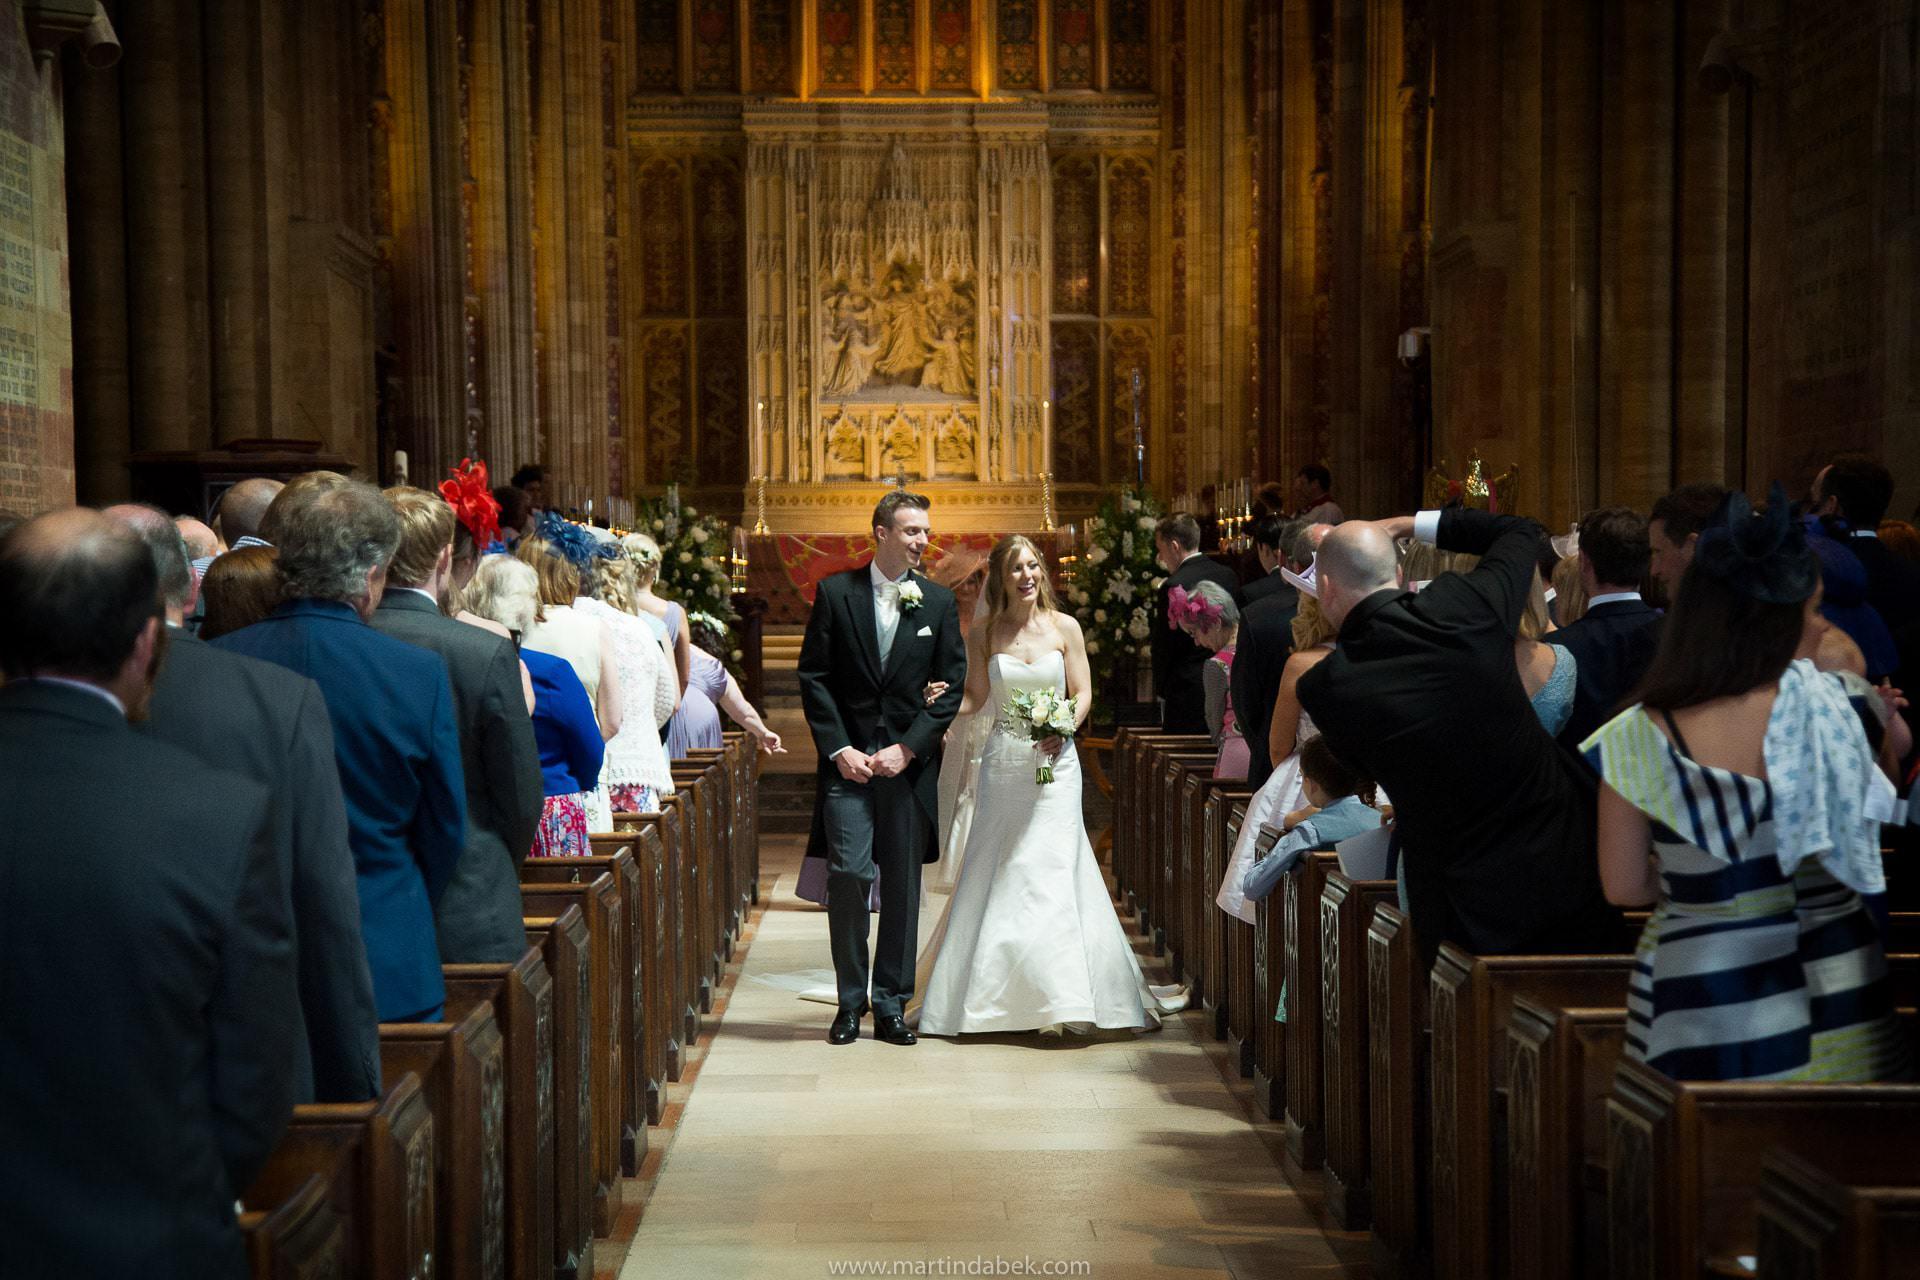 sherborne abbey wedding photography